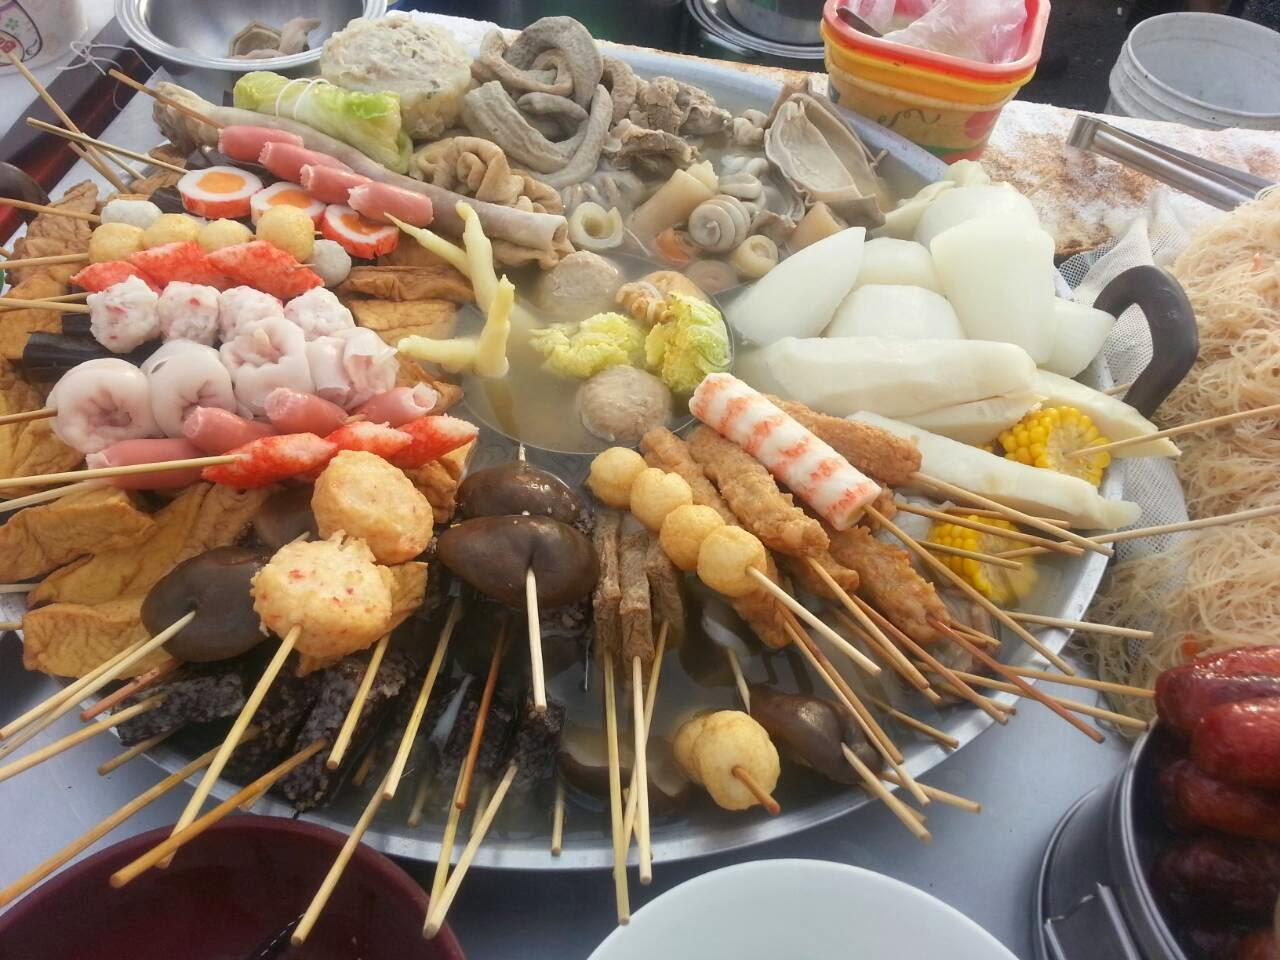 lovefisf9981: 臺南必吃隱藏版永華夜市之 湯關東煮